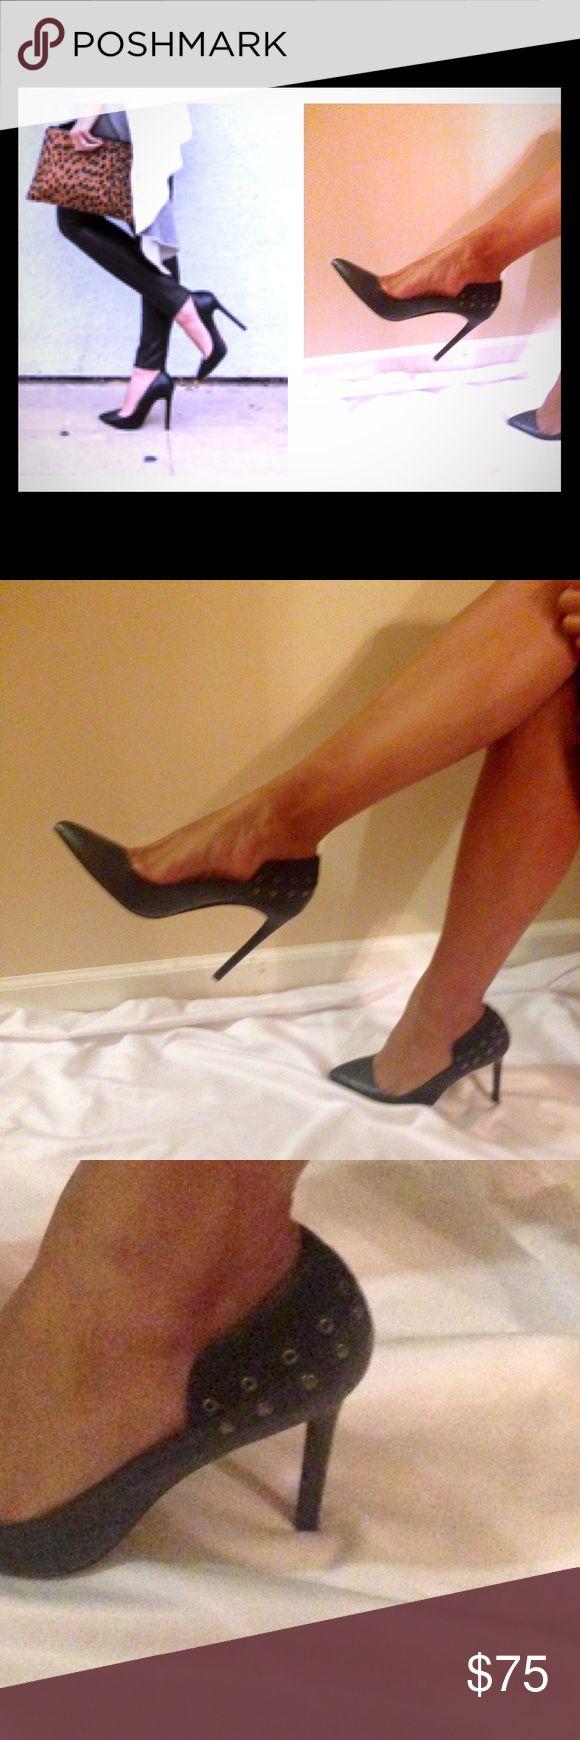 "Joe's Black Pums Heel height 4"". Perfect with jeans !! Joe's Shoes Heels"